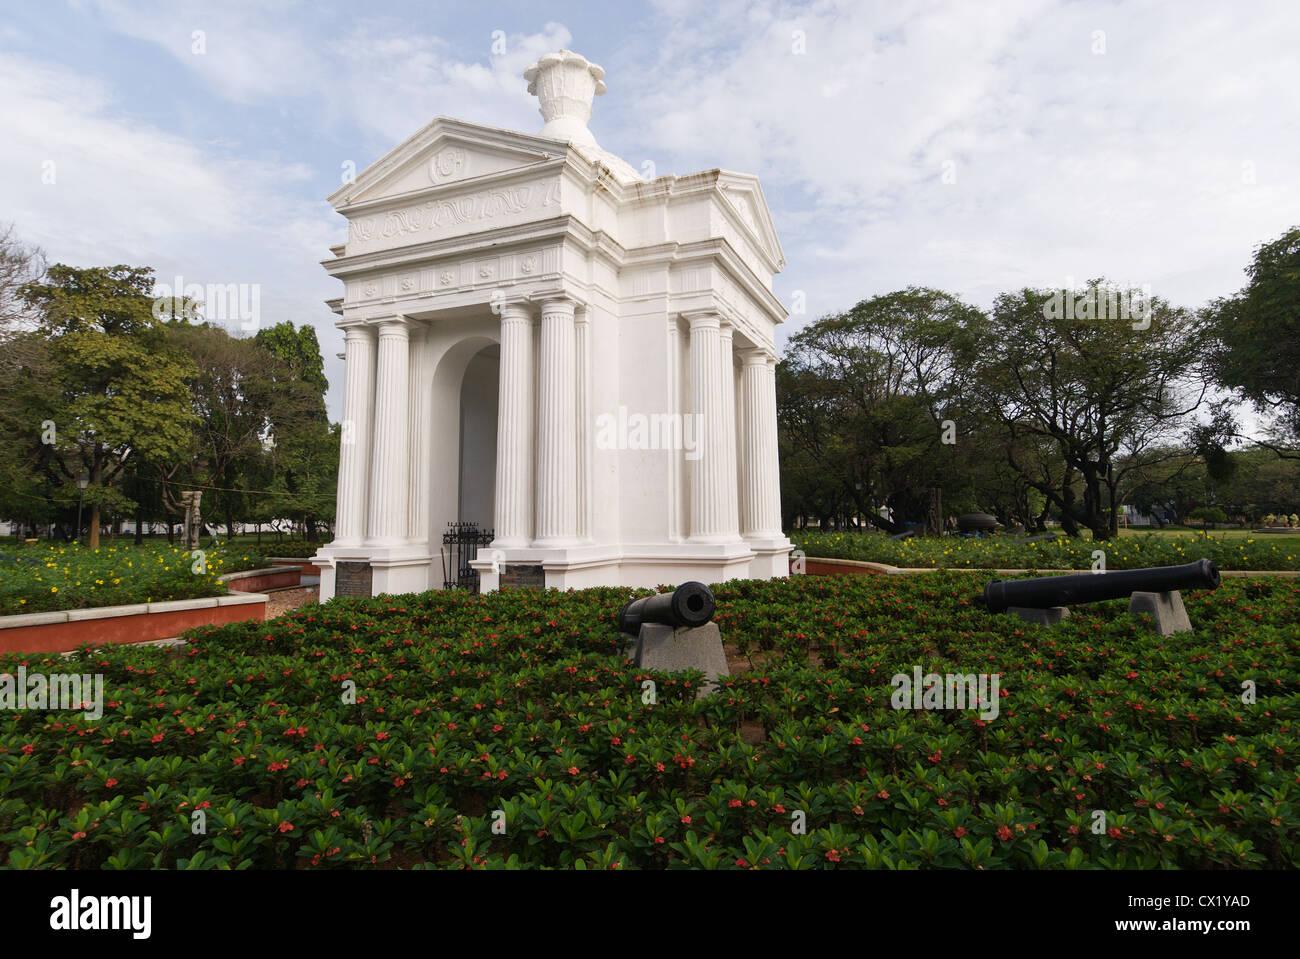 Elk201-4427 India, Tamil Nadu, Pondicherry, Government Square - Stock Image